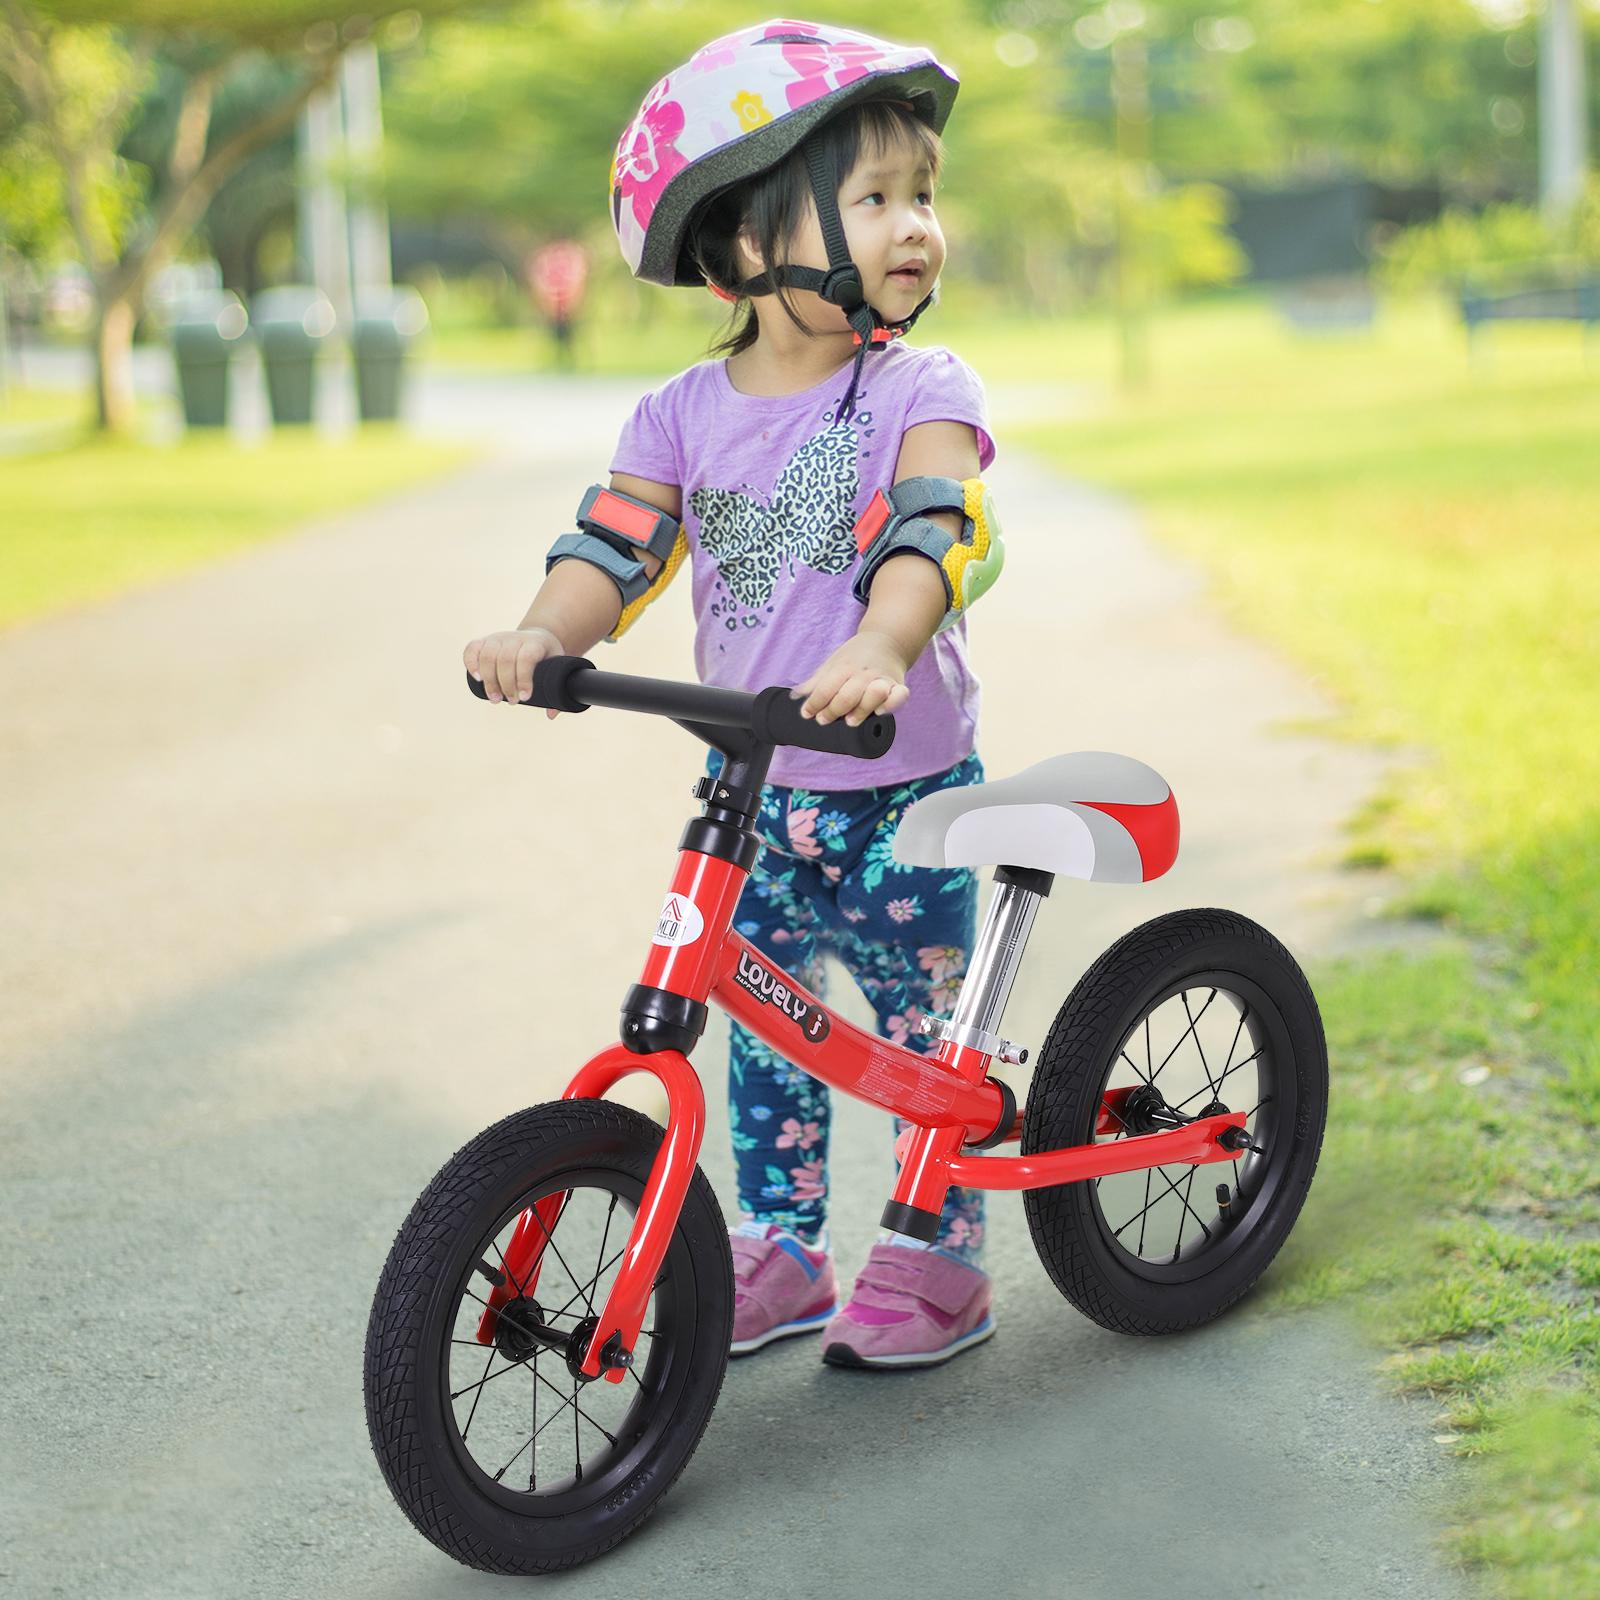 Bicicleta-sin-Pedales-de-Altura-de-Asiento-Regulable-31-45cm-2-5-Anos miniatura 23